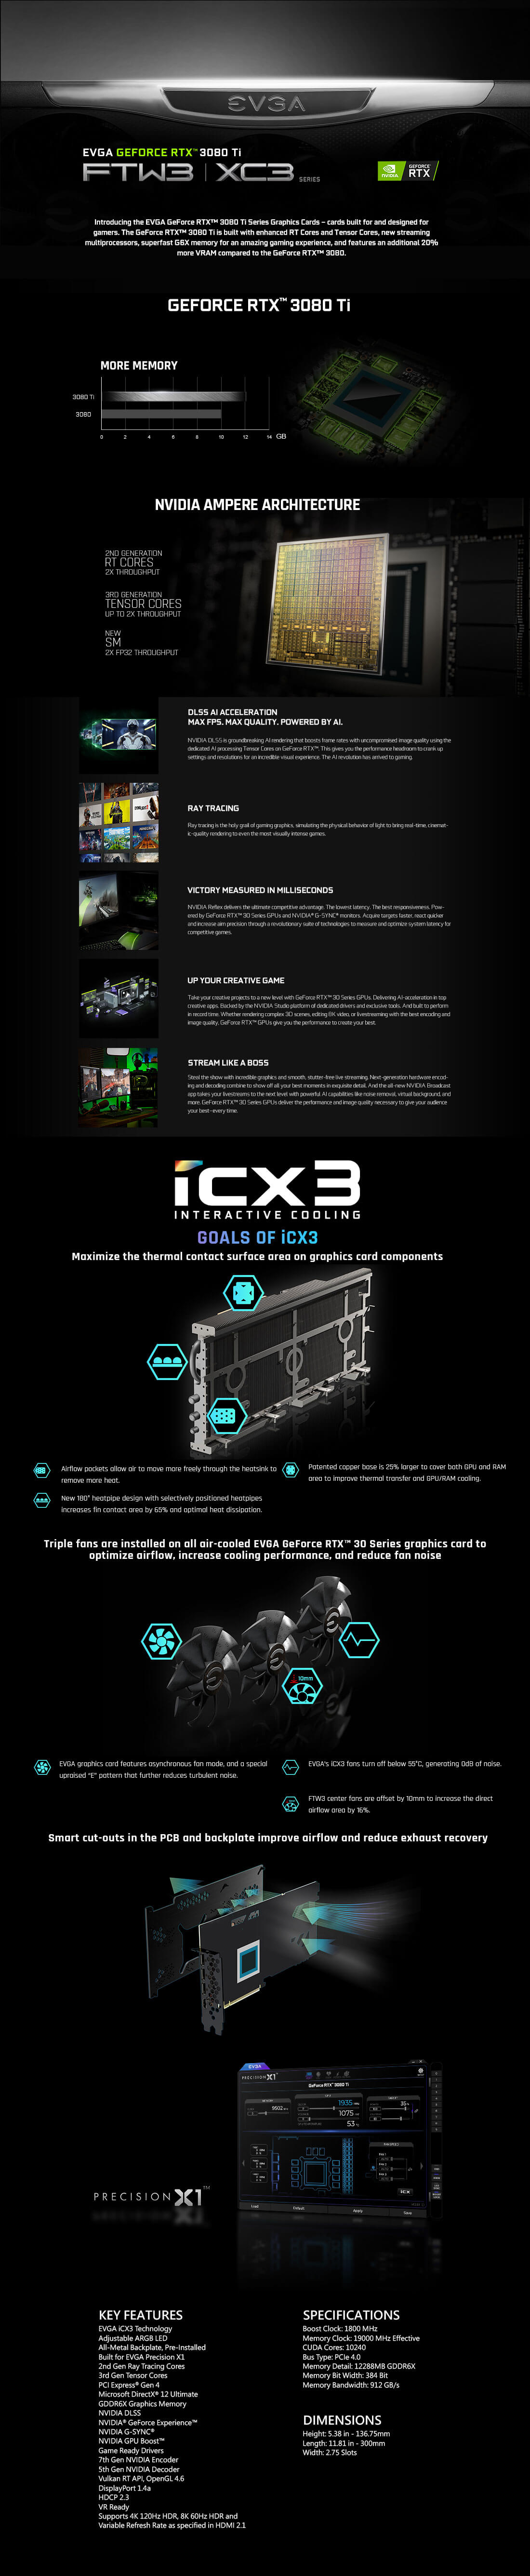 EVGA GeForce RTX™ 3080 Ti FTW3 ULTRA GAMING - 12GB GDDR6X